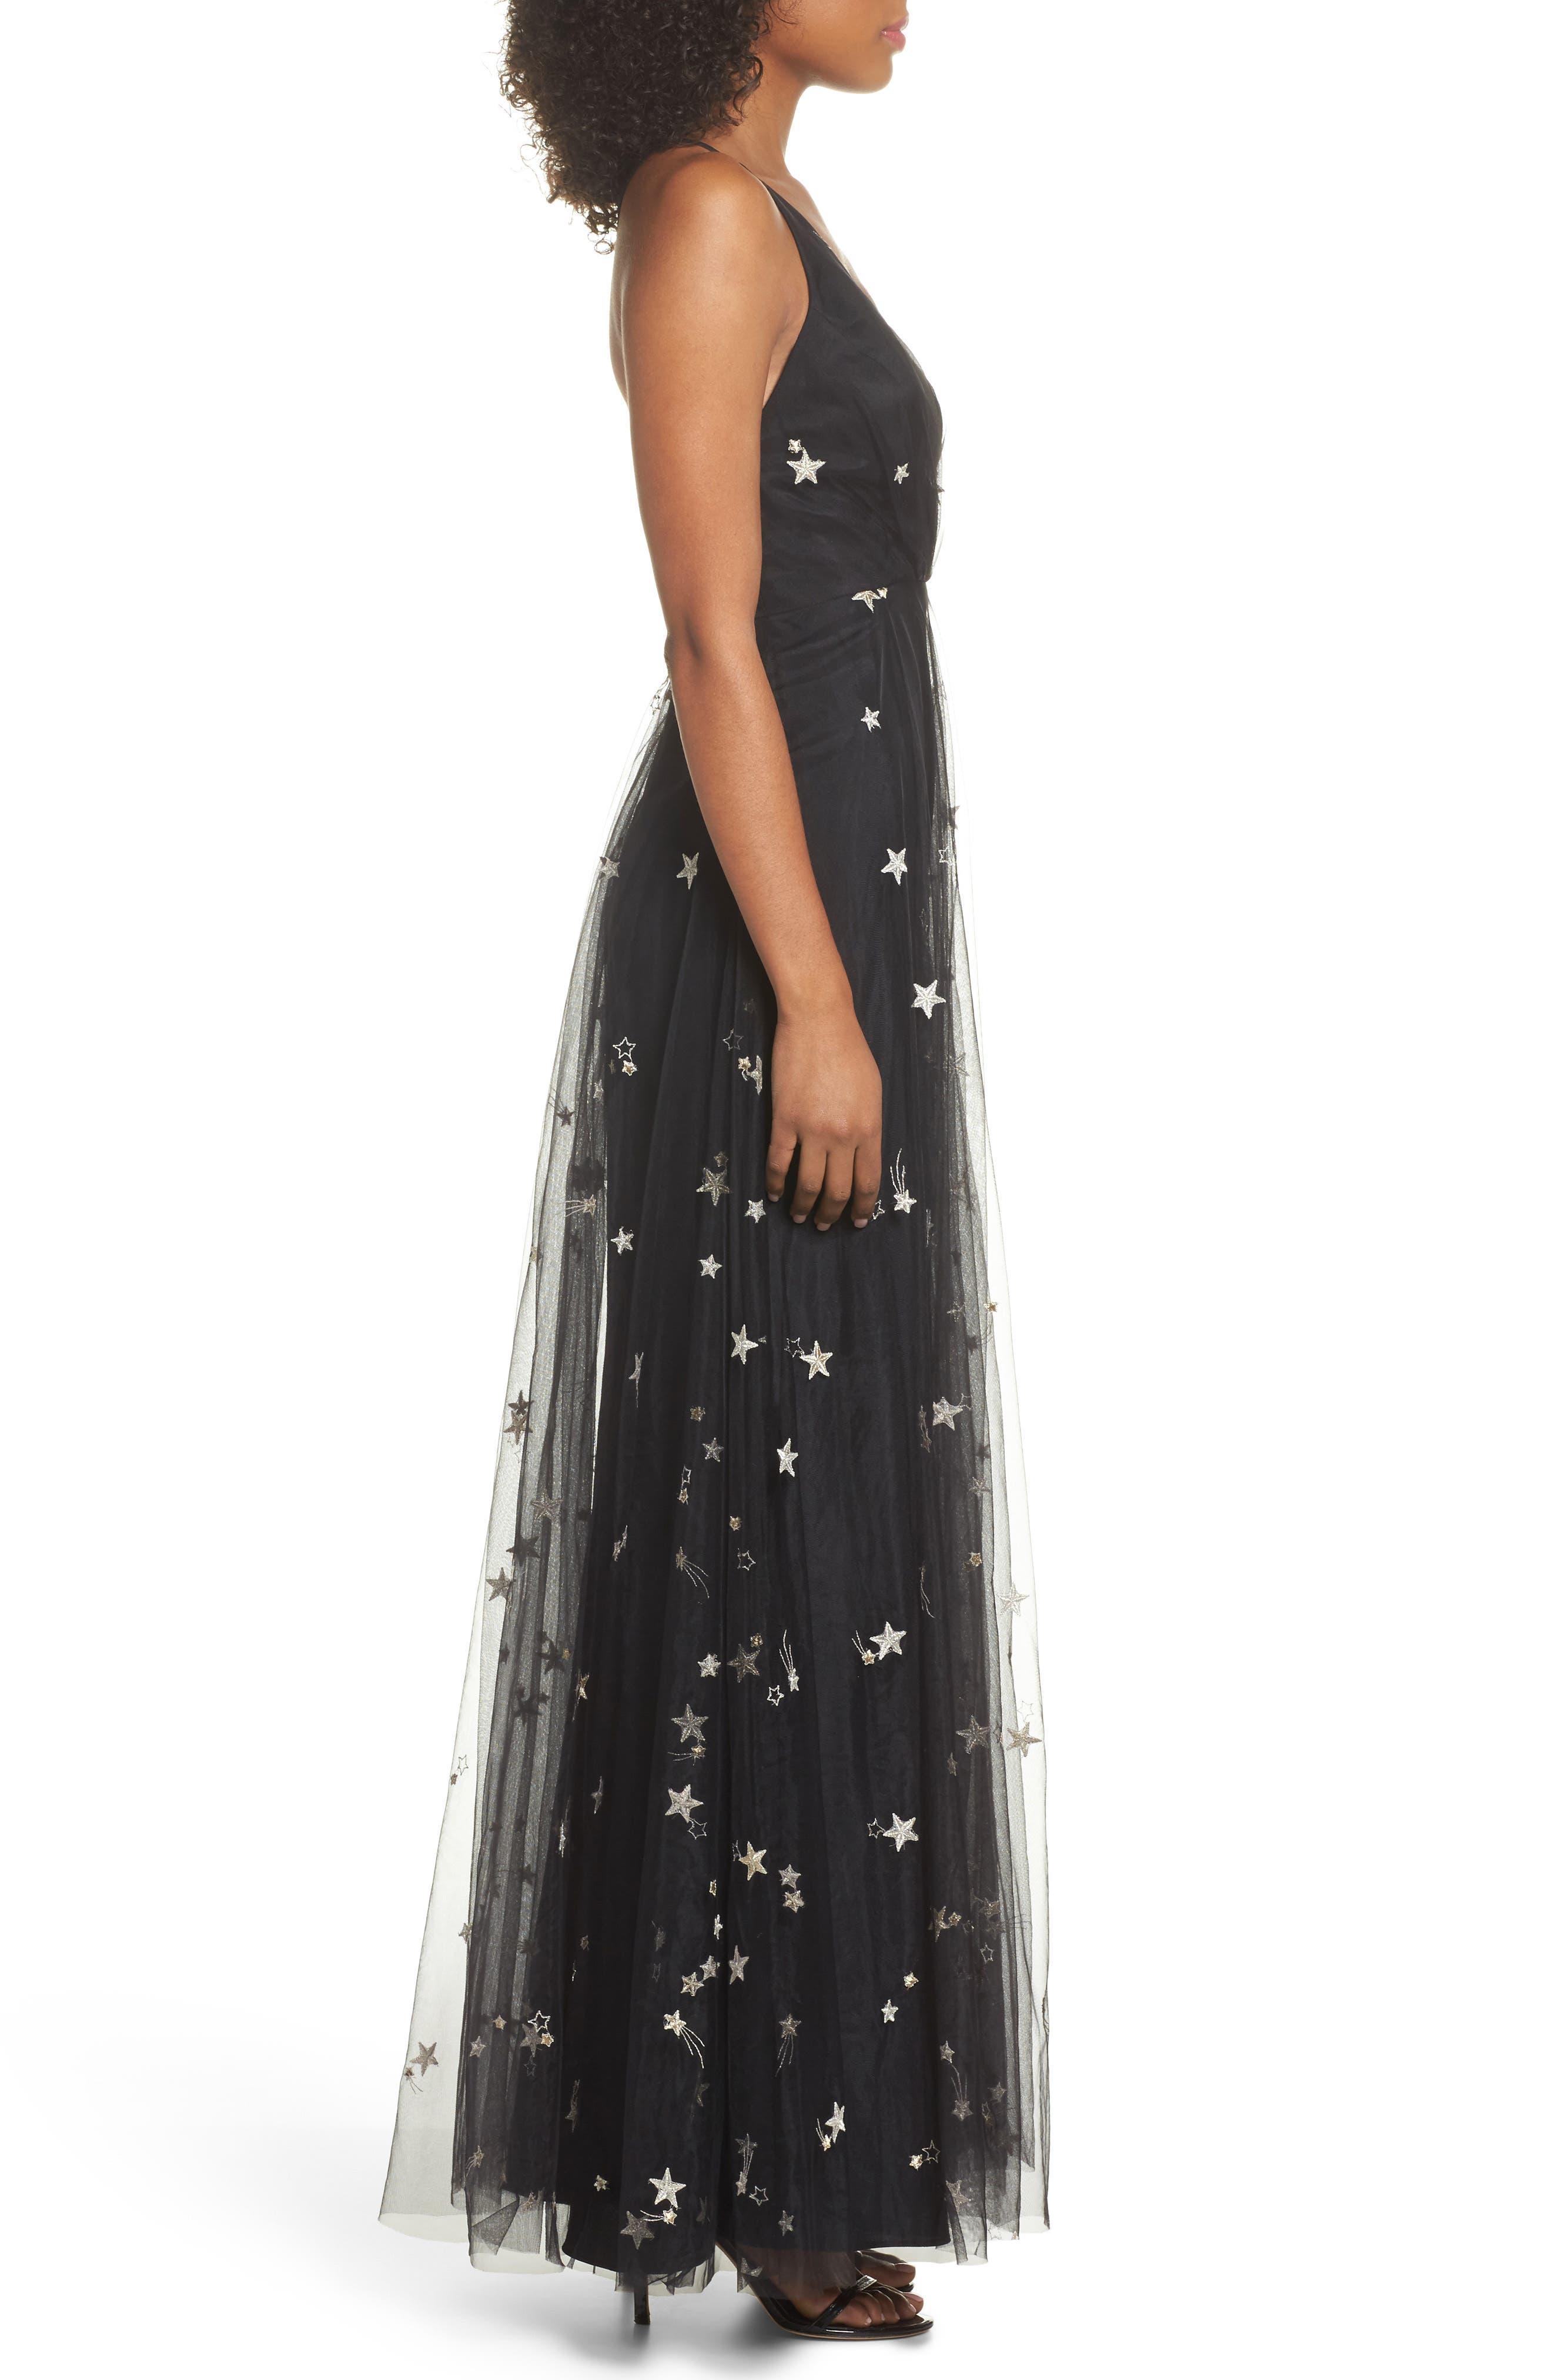 Chelsea Starry Night Embroidered Halter Maxi Dress,                             Alternate thumbnail 3, color,                             Black/ Metallic